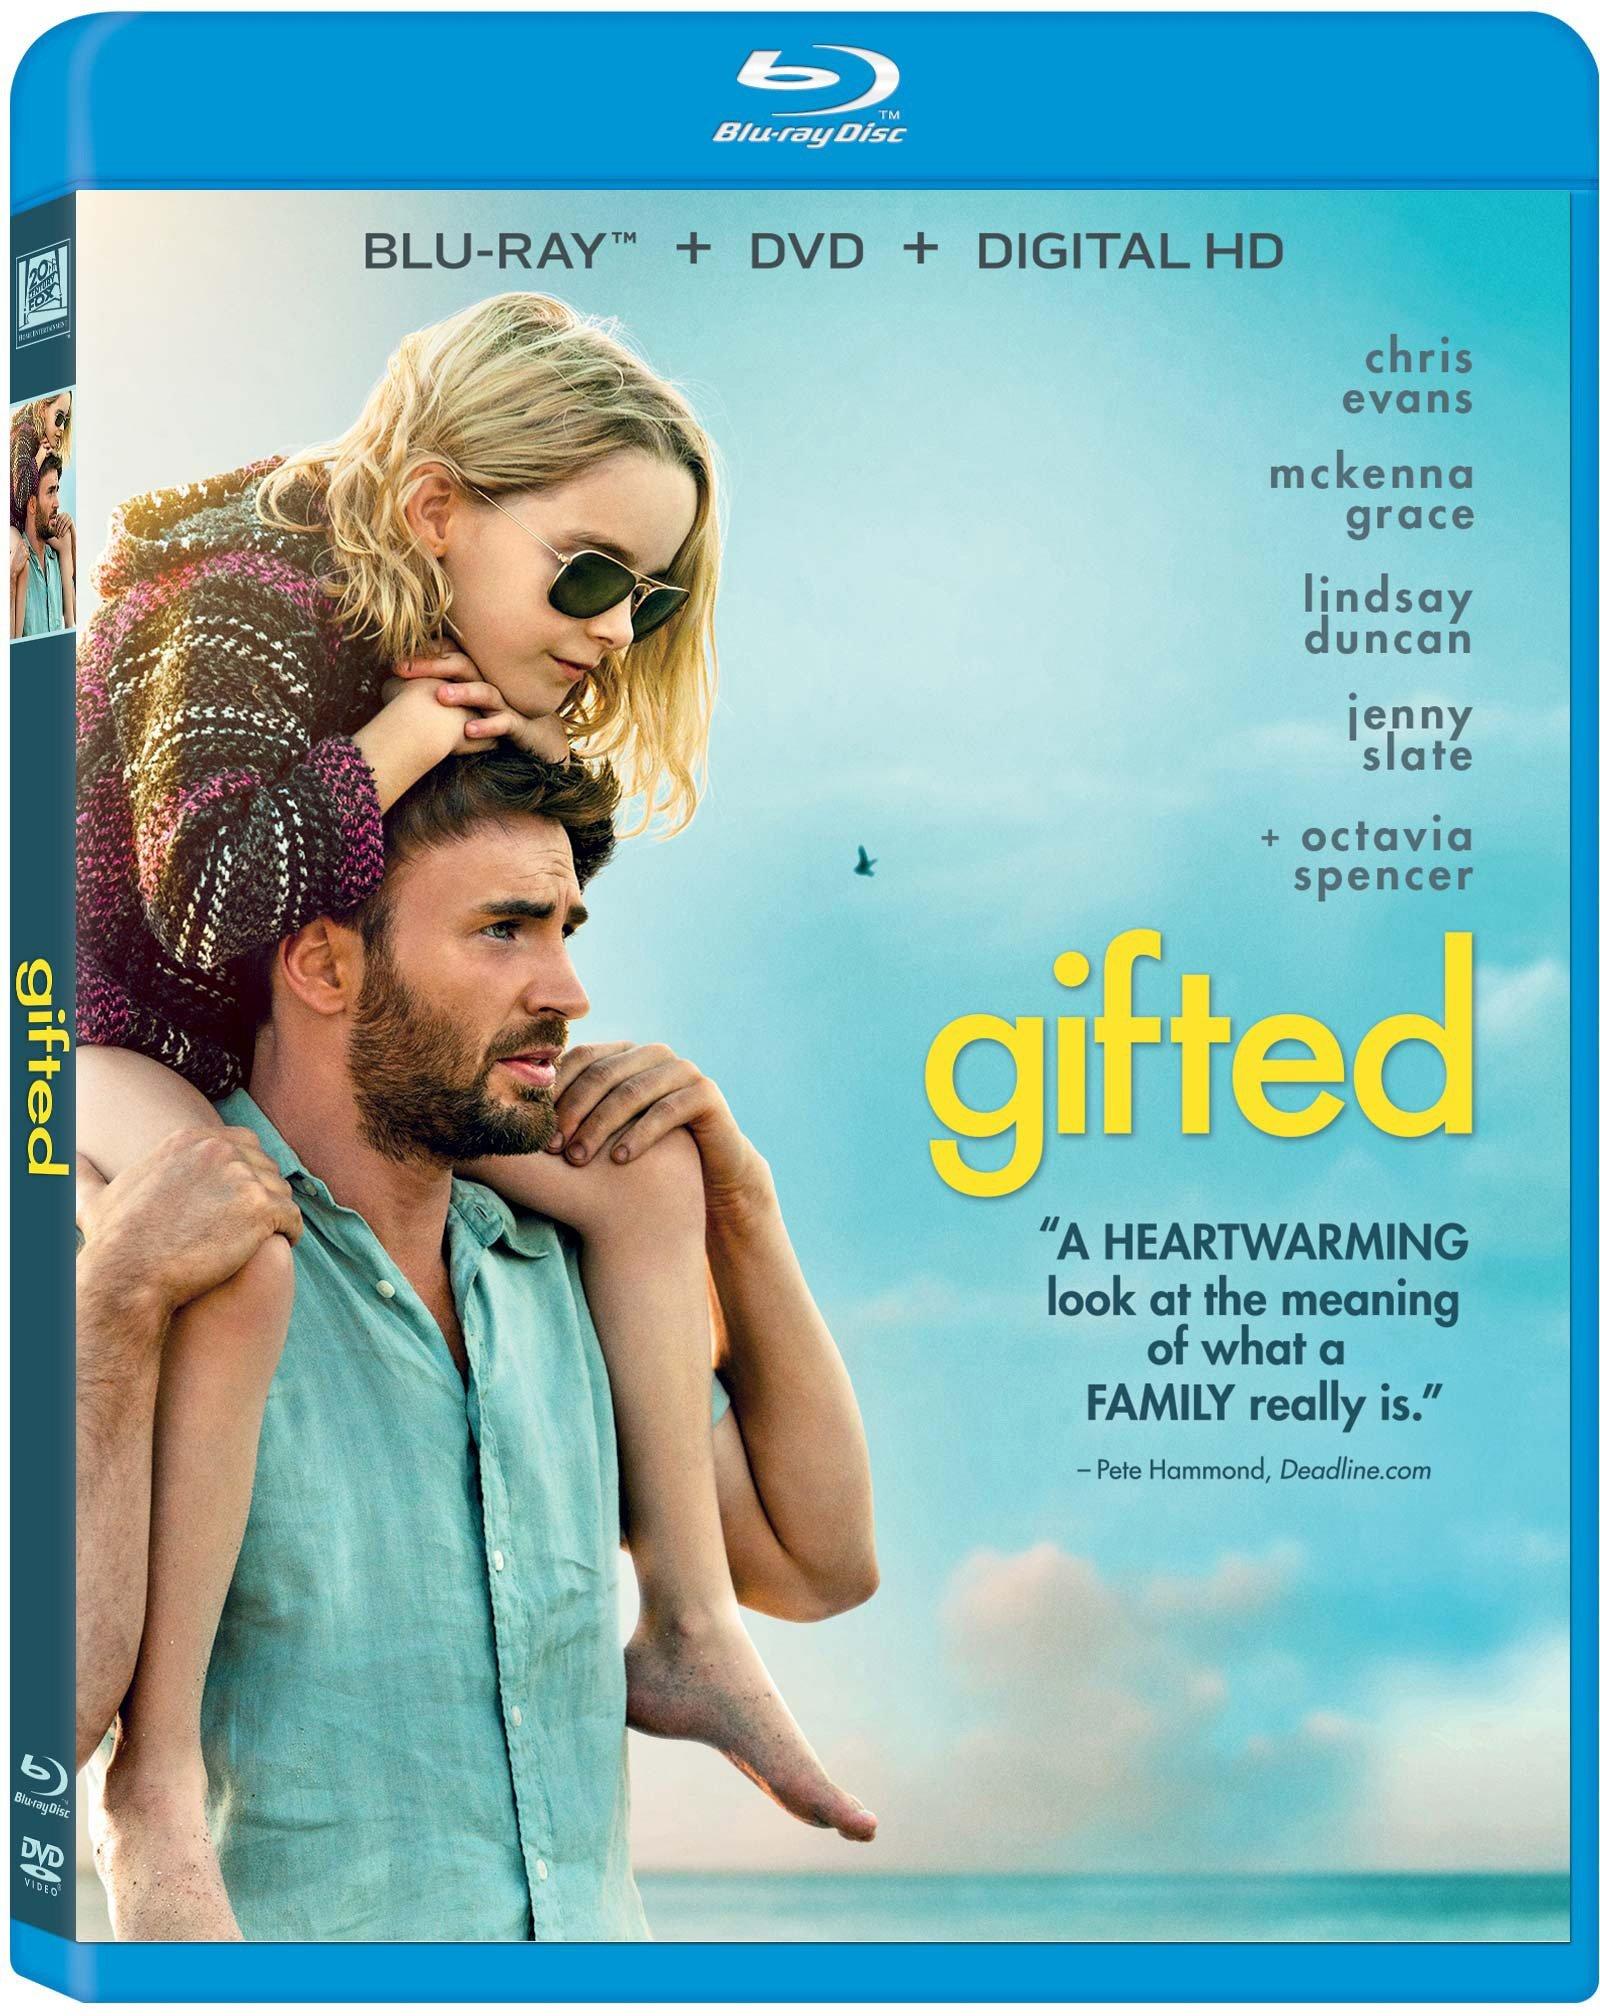 Blu-ray : Gifted (Blu-ray)